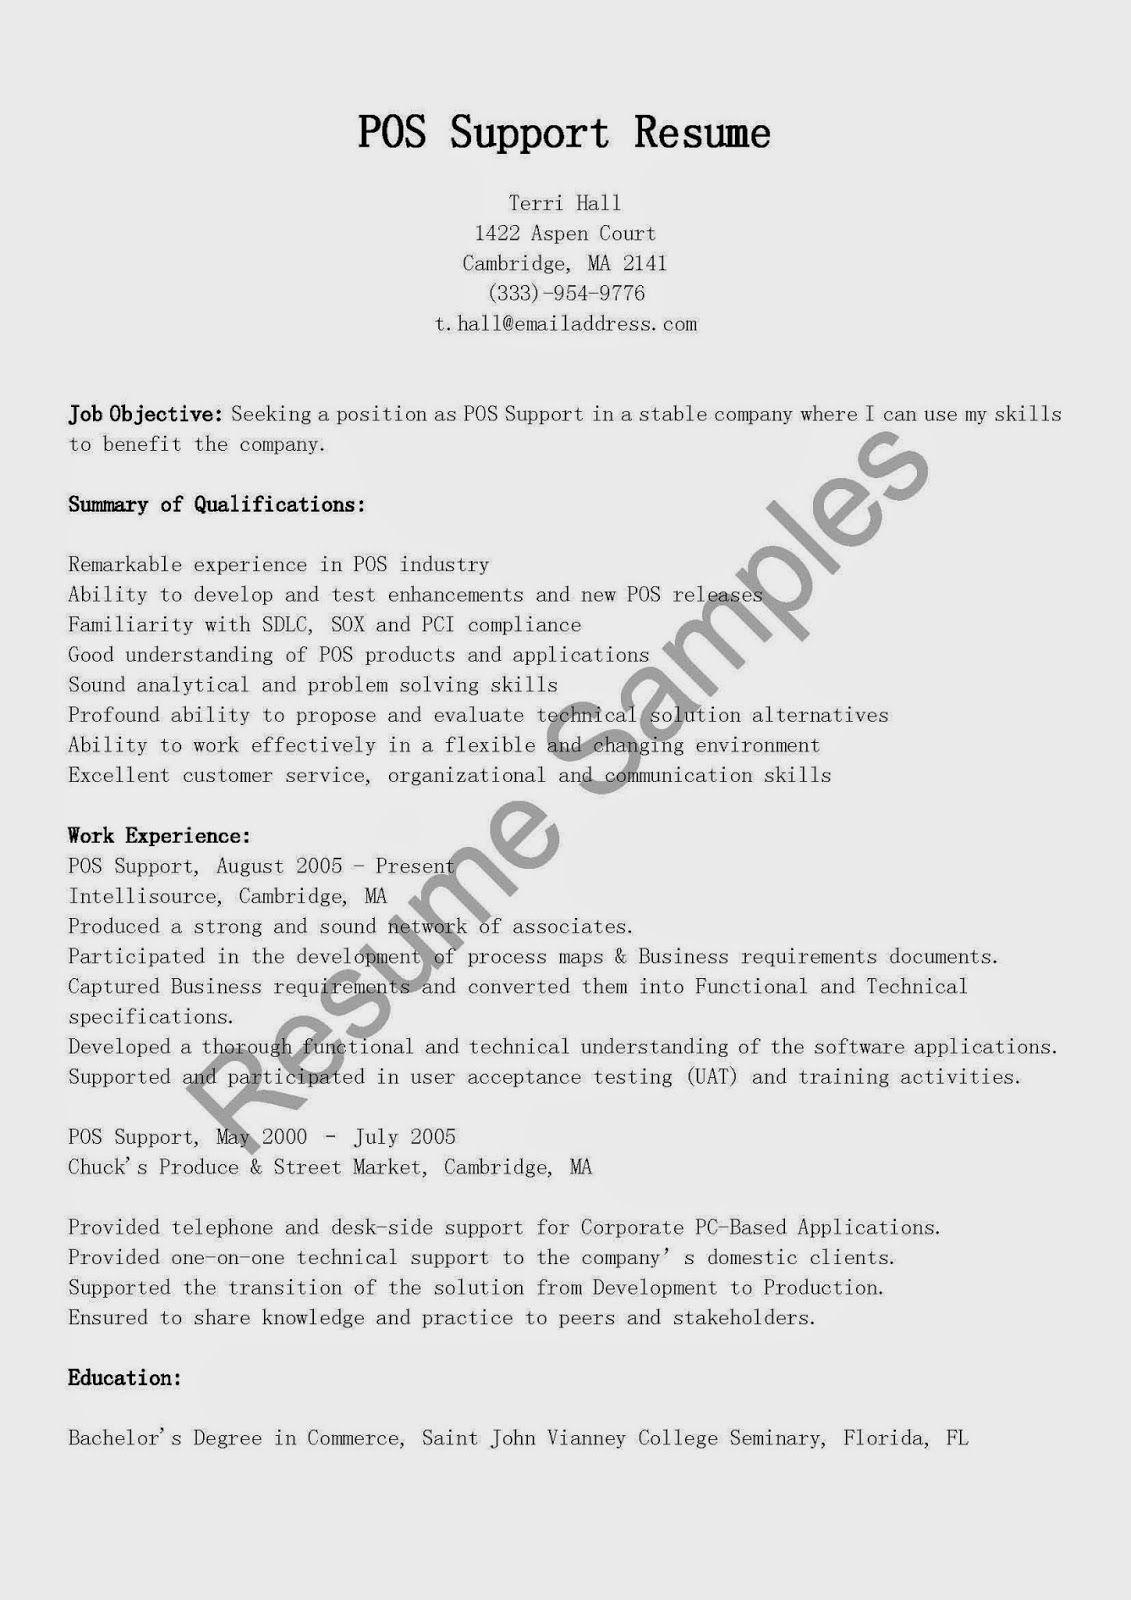 Pos Support Resume Sample Curriculum Vitae Resume Examples Resume